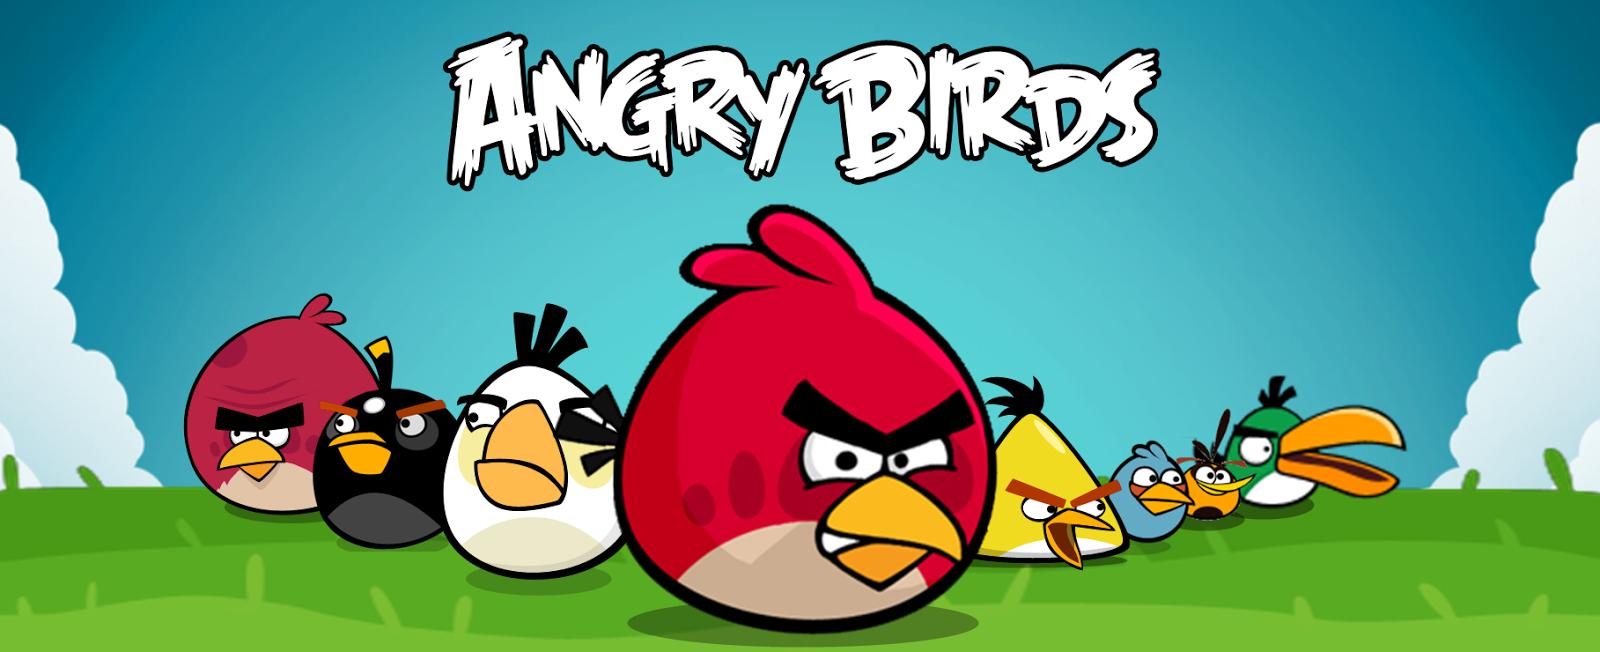 Web Dev Net Angry Birds Of Javascript Green Bird Mocking